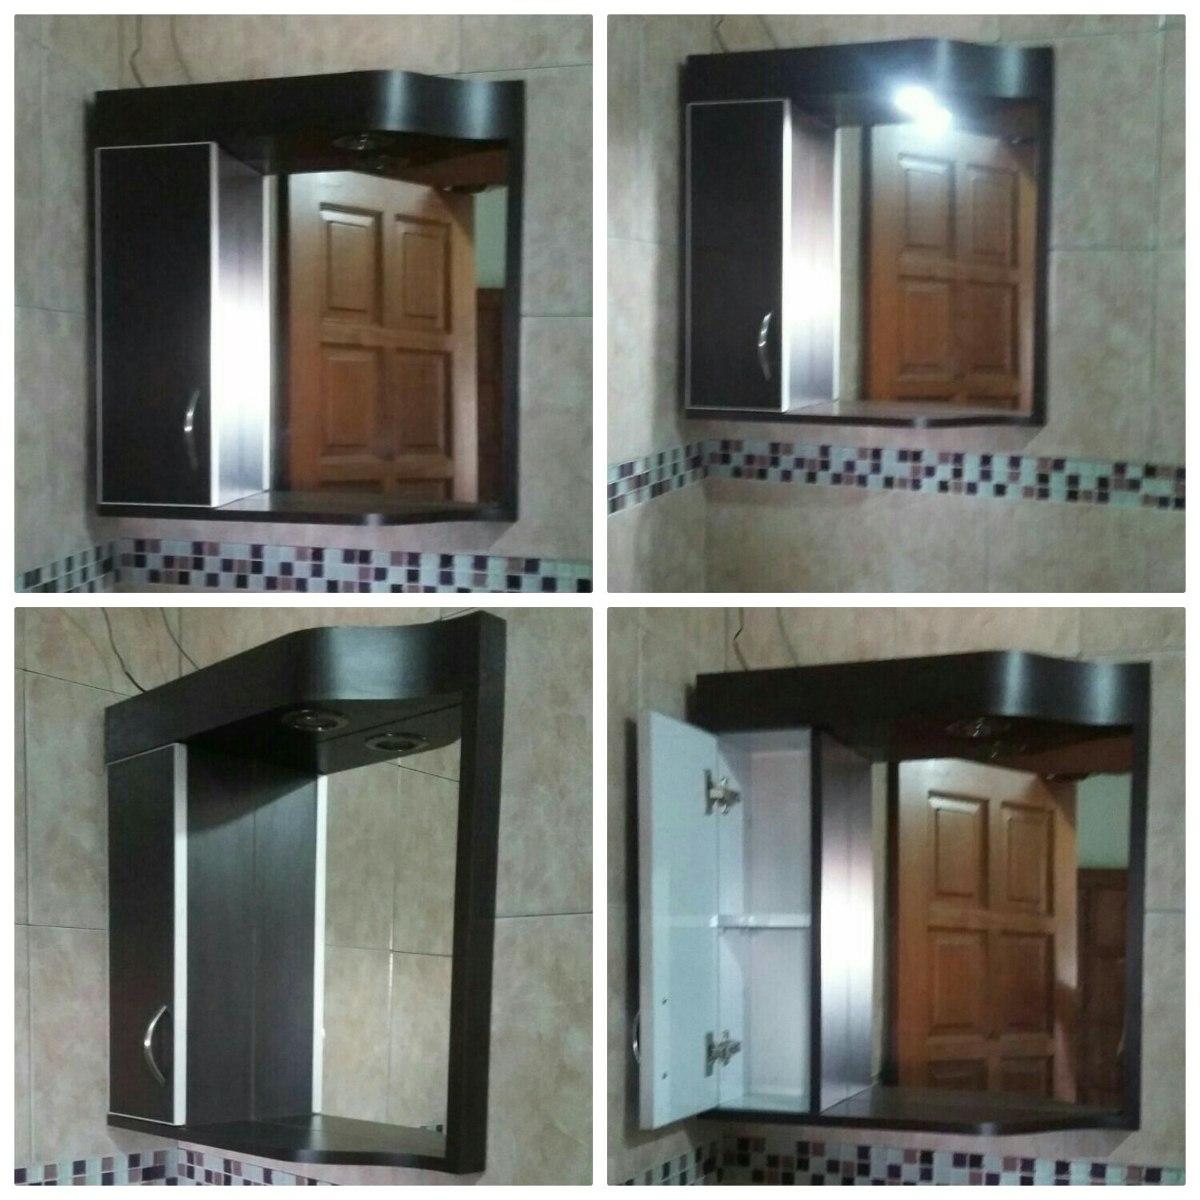 Cocinas empotradas closets muebles de ba os puertas - Puertas muebles de cocina precios ...